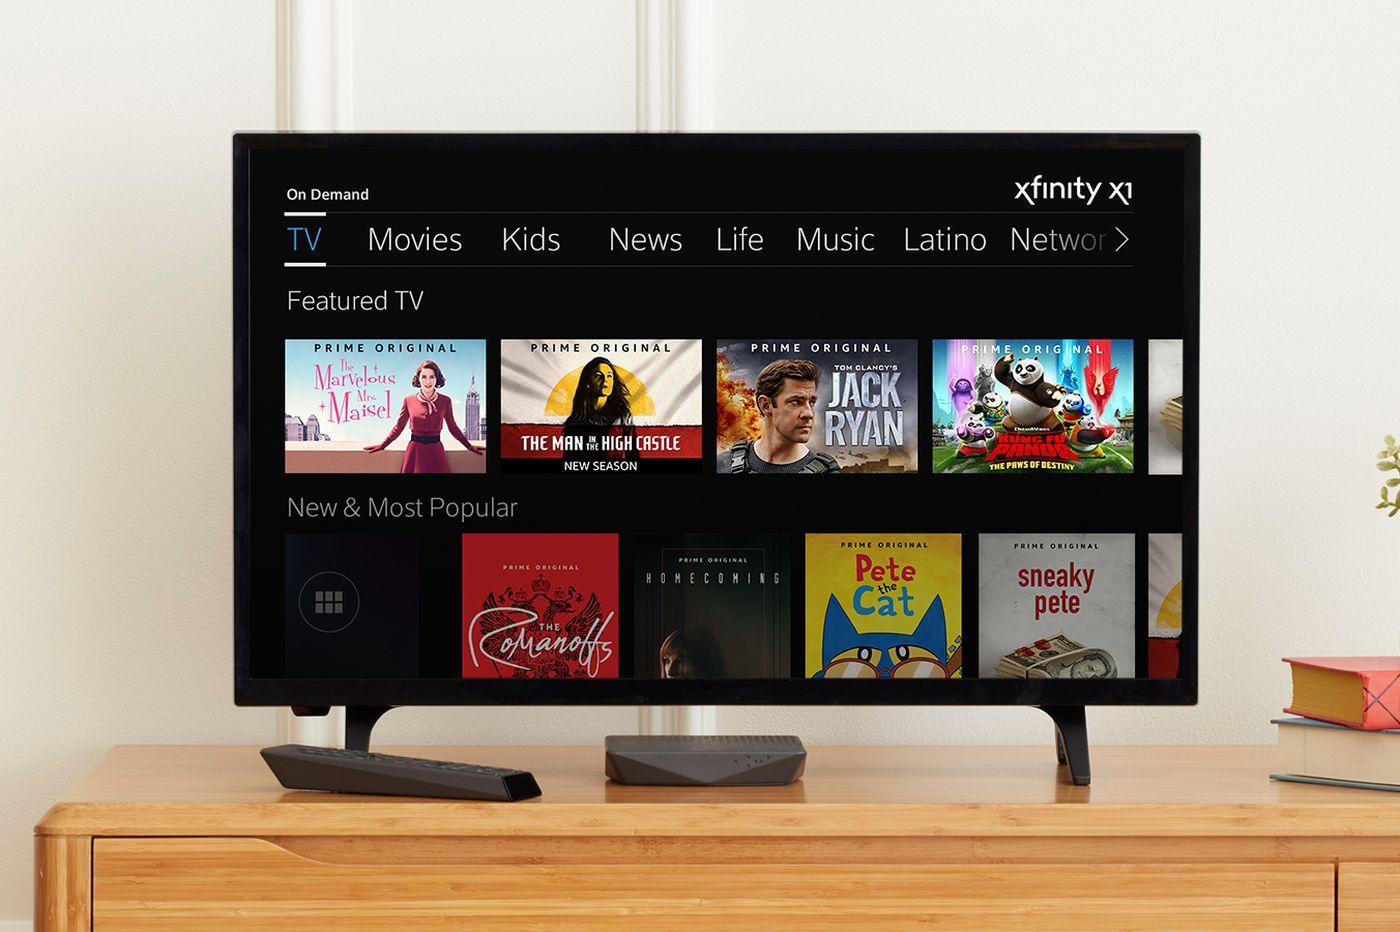 Xfinity adds Amazon Prime Video to X1